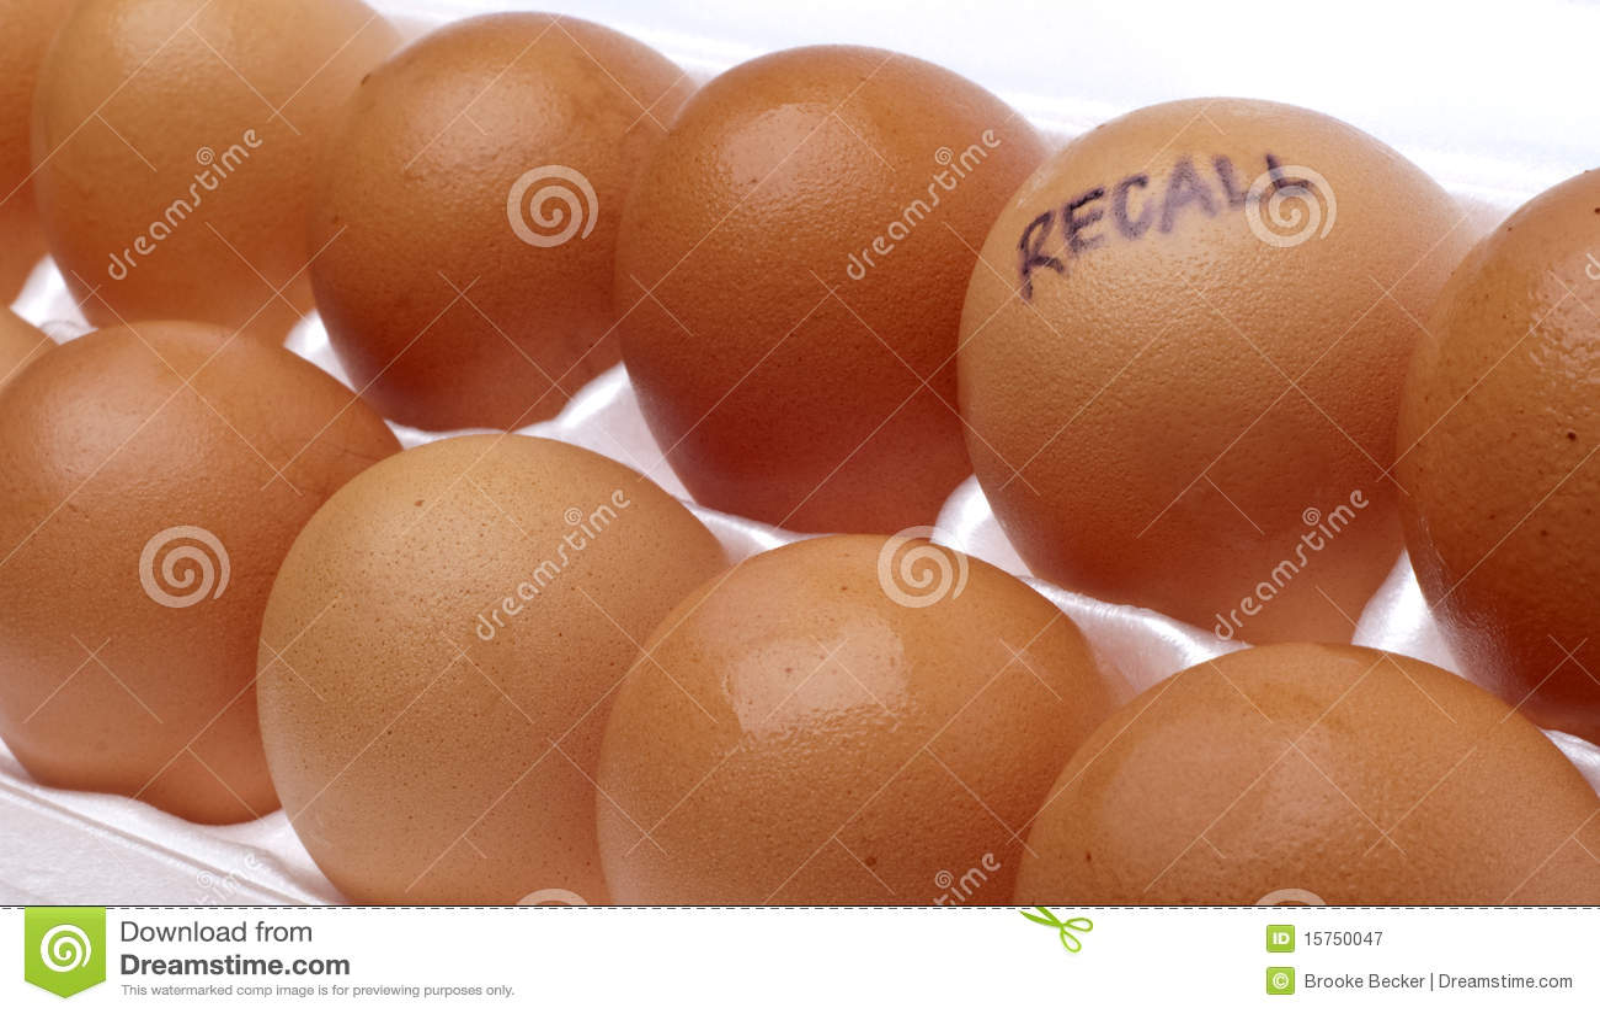 egg recall - photo #40